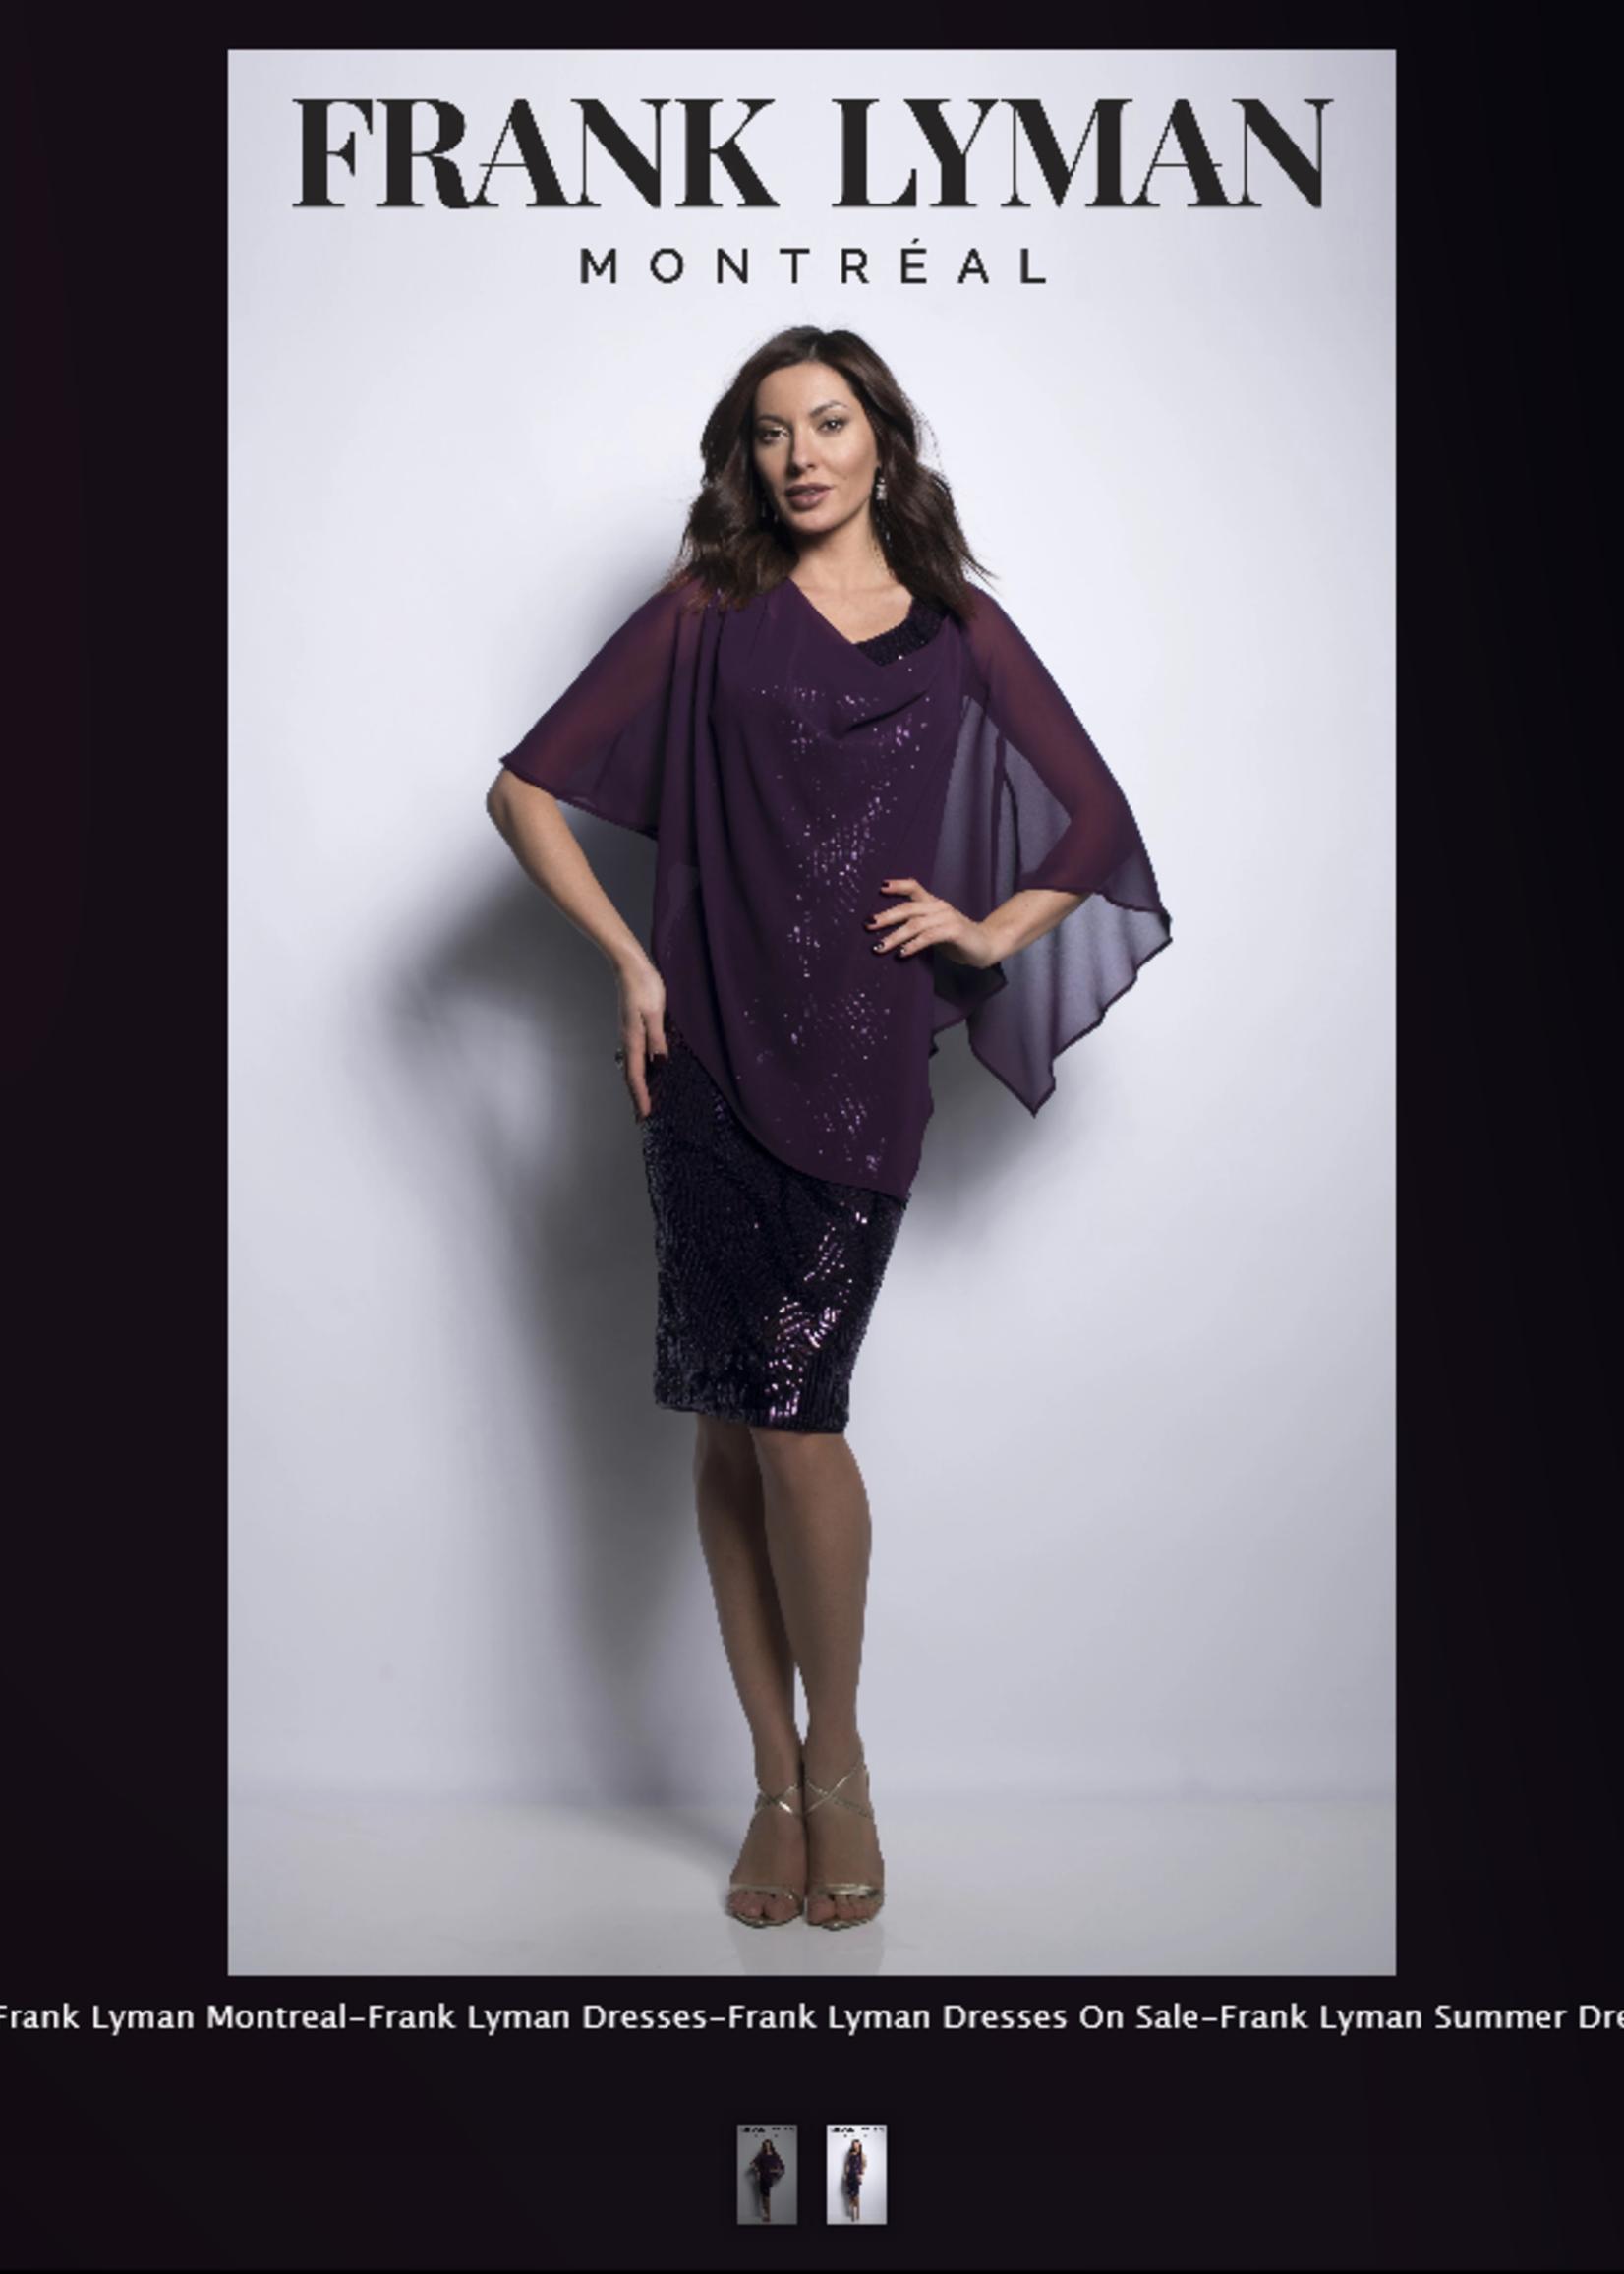 FRANK LYMAN Burgundy sparkle dress with shear